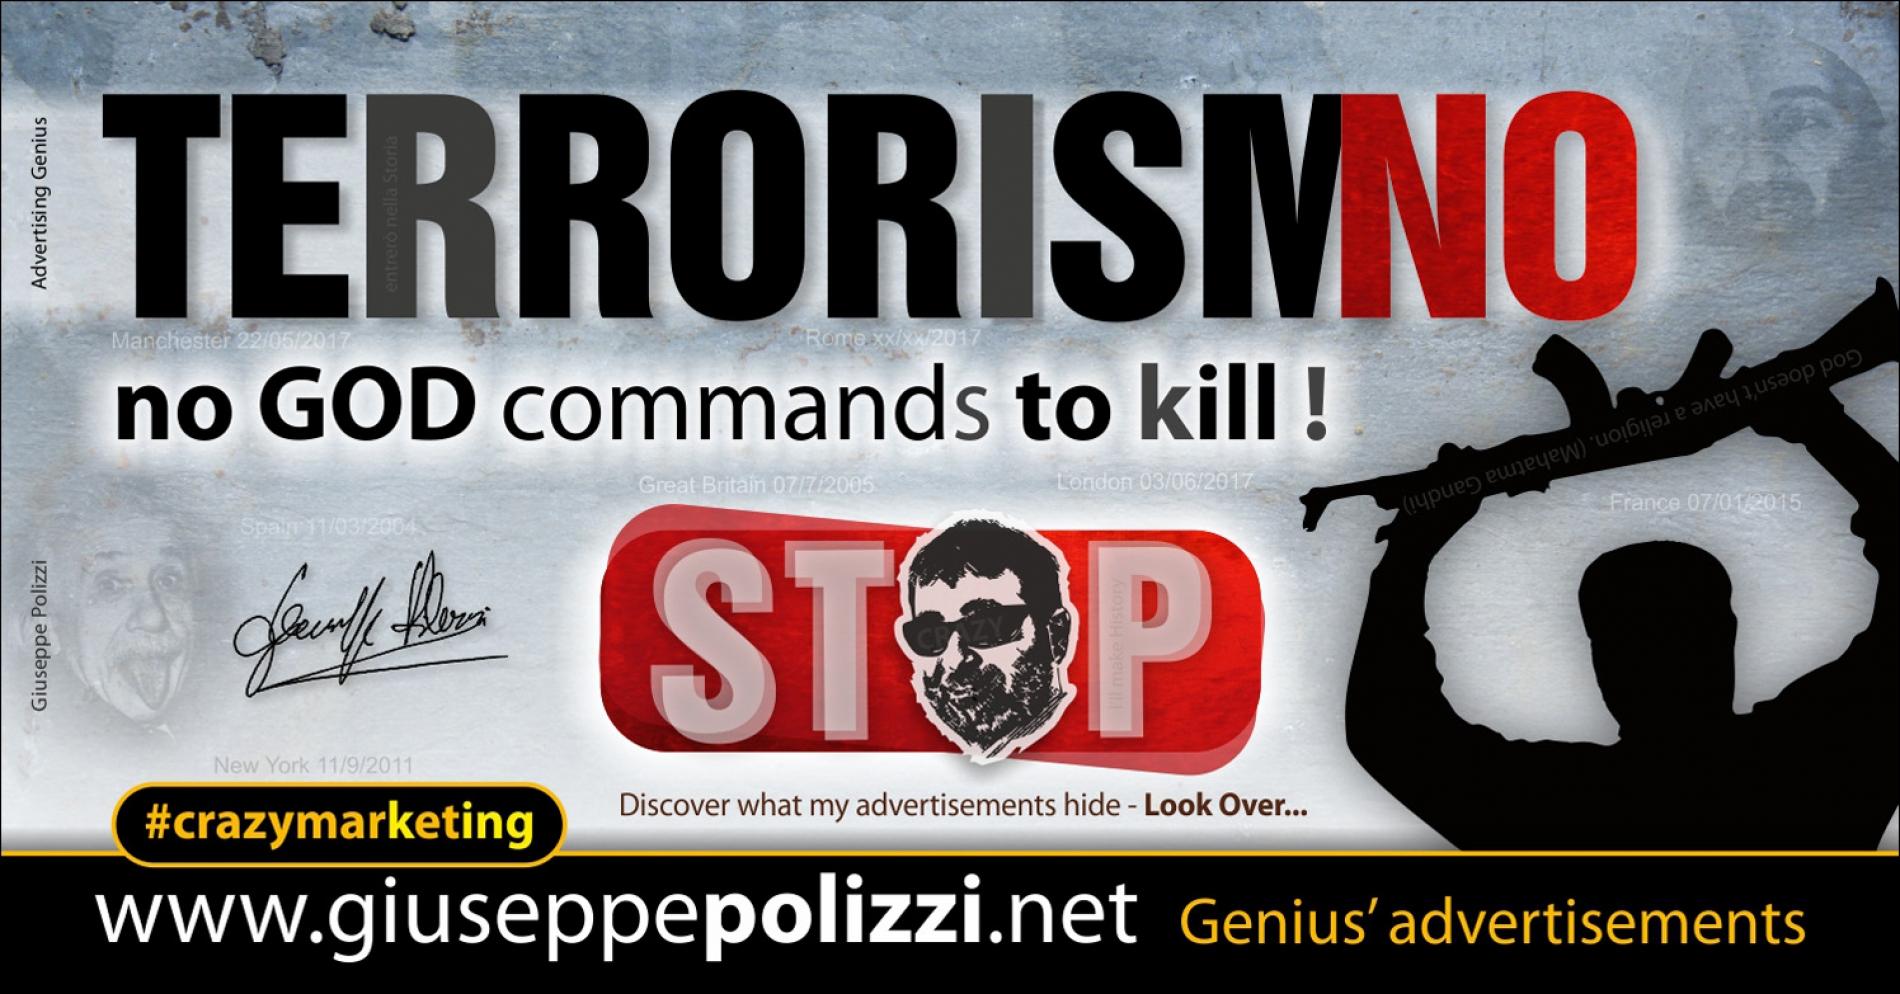 giuseppe polizzi TerrorismNO crazy marketing genius  2017